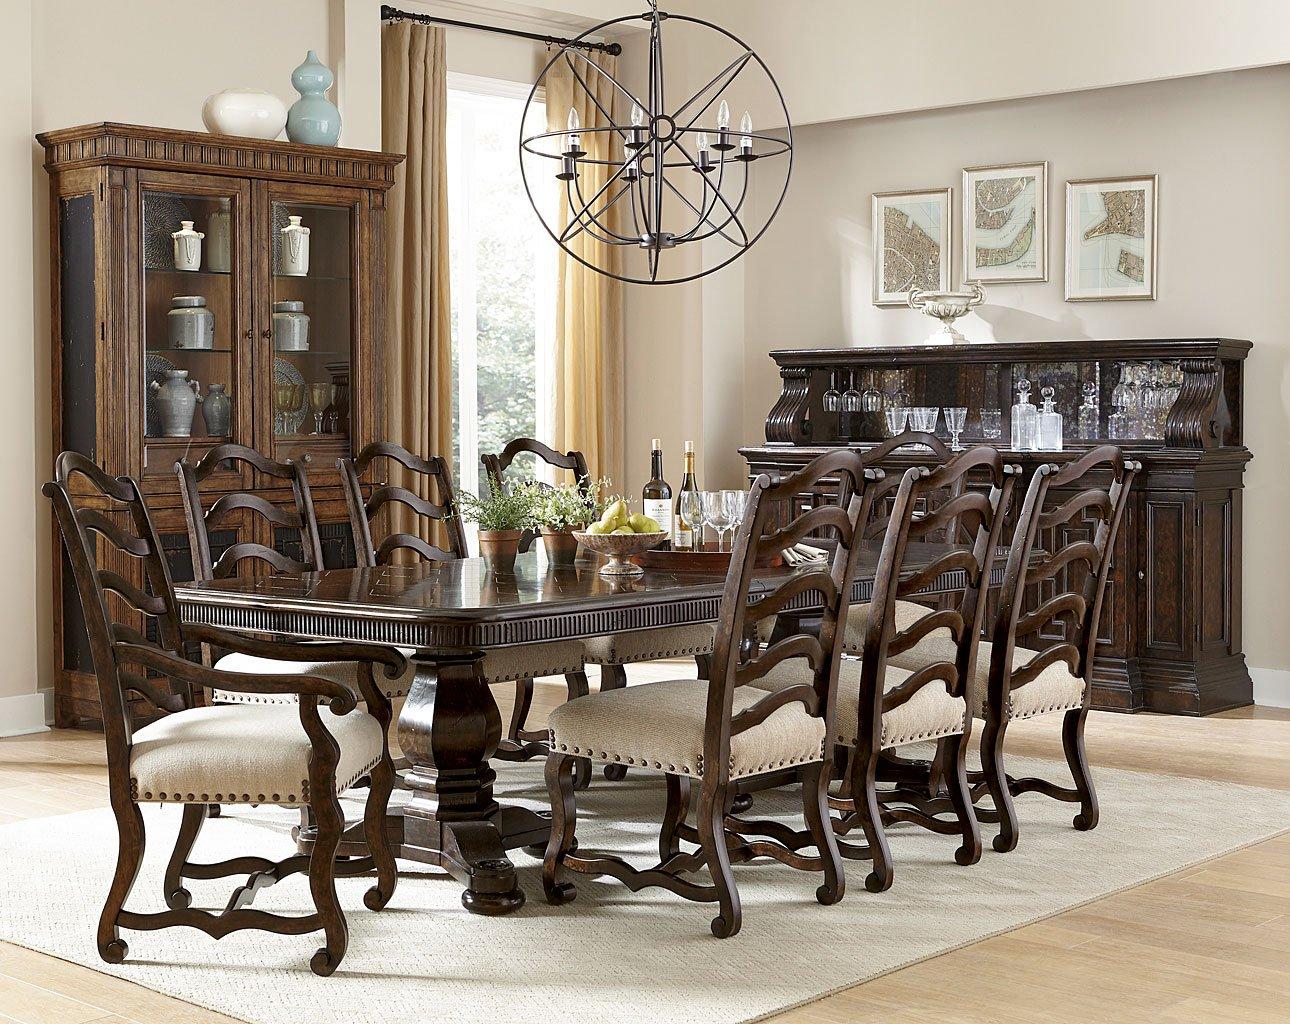 Harvest Dining Room Table | Collection One Harvest Dining Room Set Tortoise Art Furniture